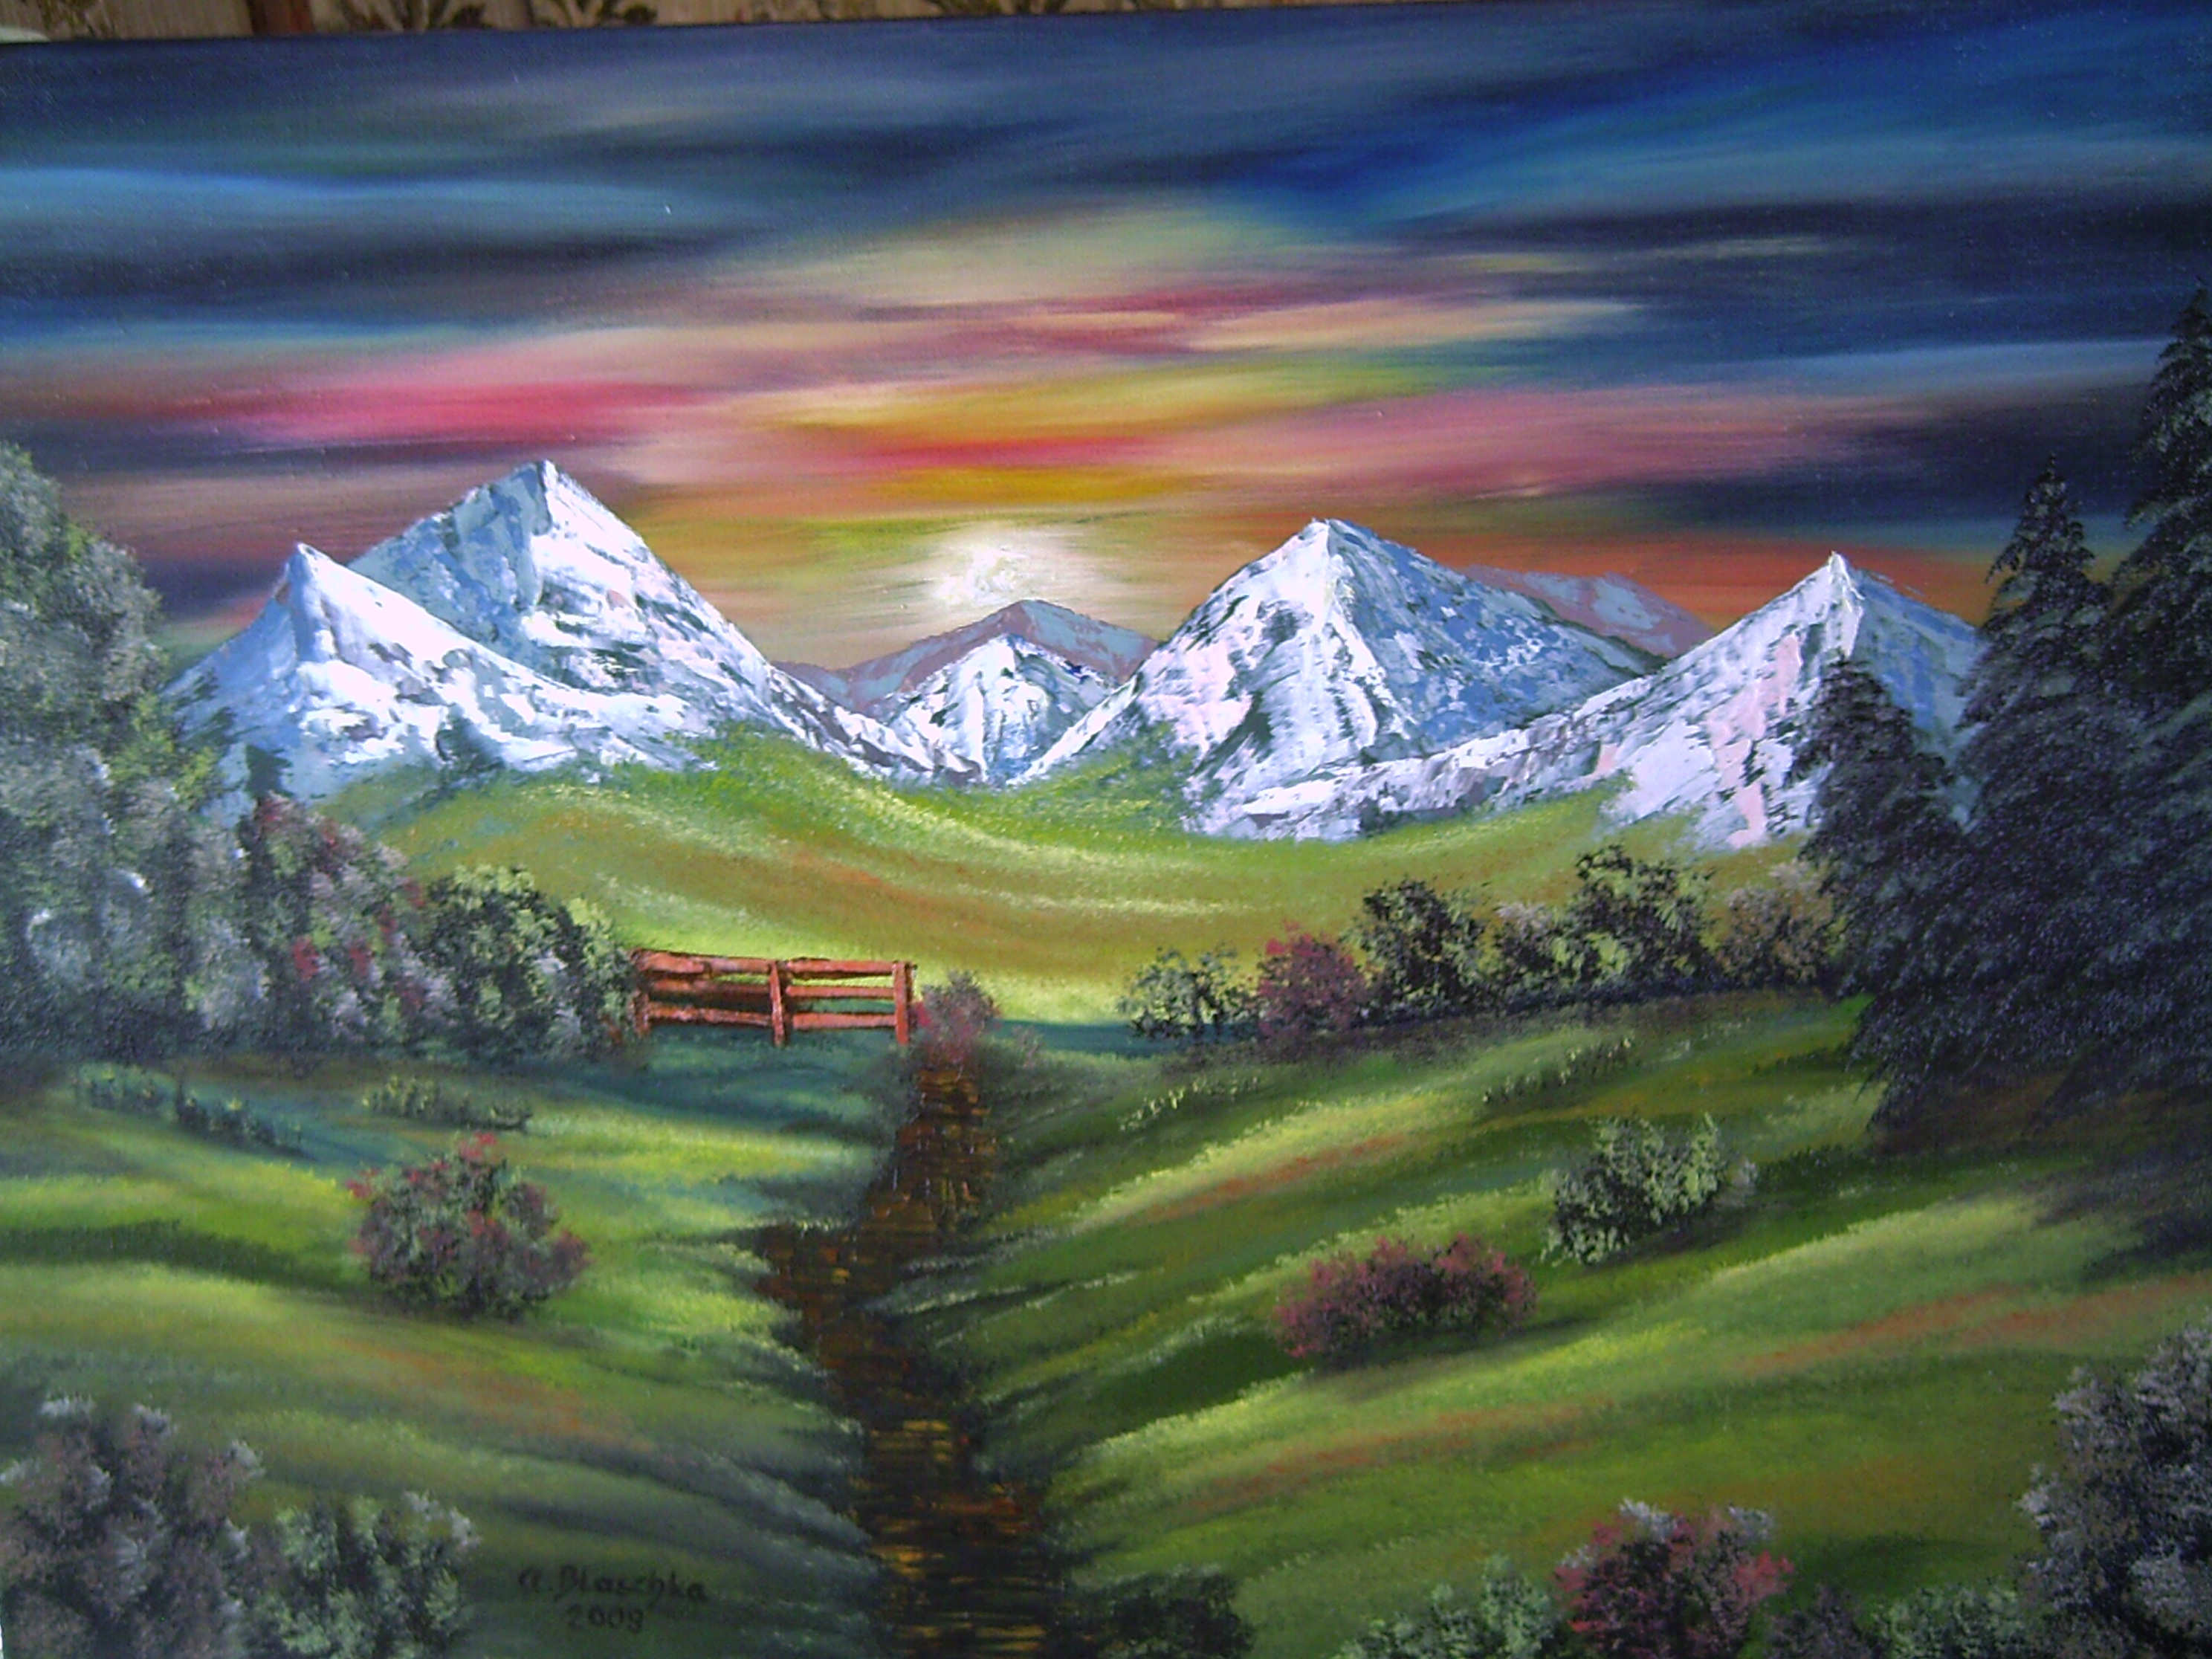 Antonie's Malerei: Landschaften nach Bob Ross